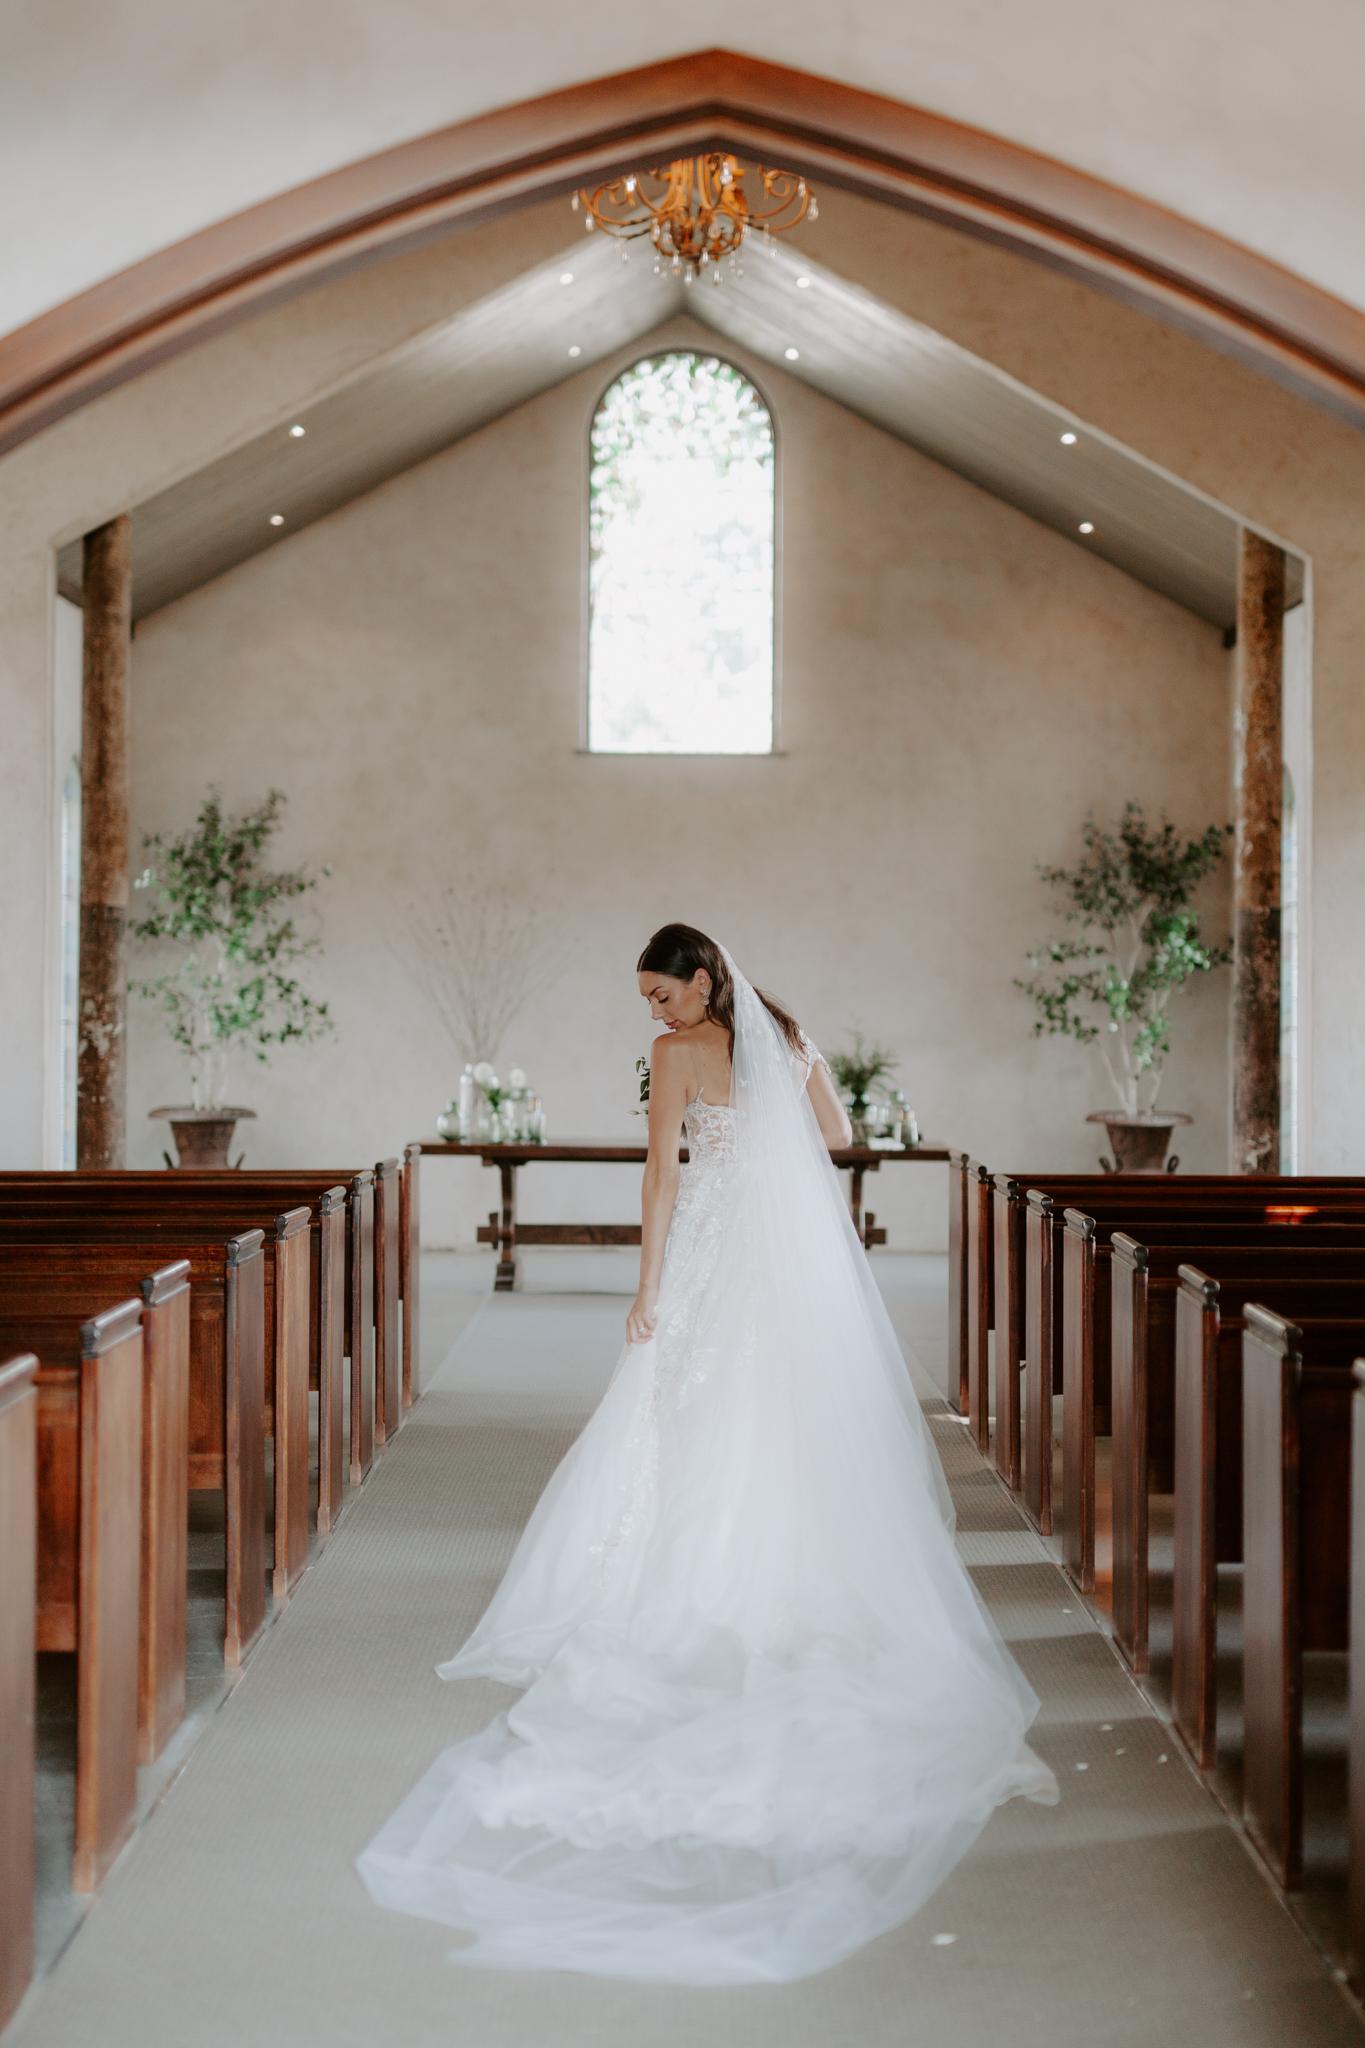 The-Stones-of-Yarra-Valley-Wedding-EmotionsandMathPhotography-147.jpg